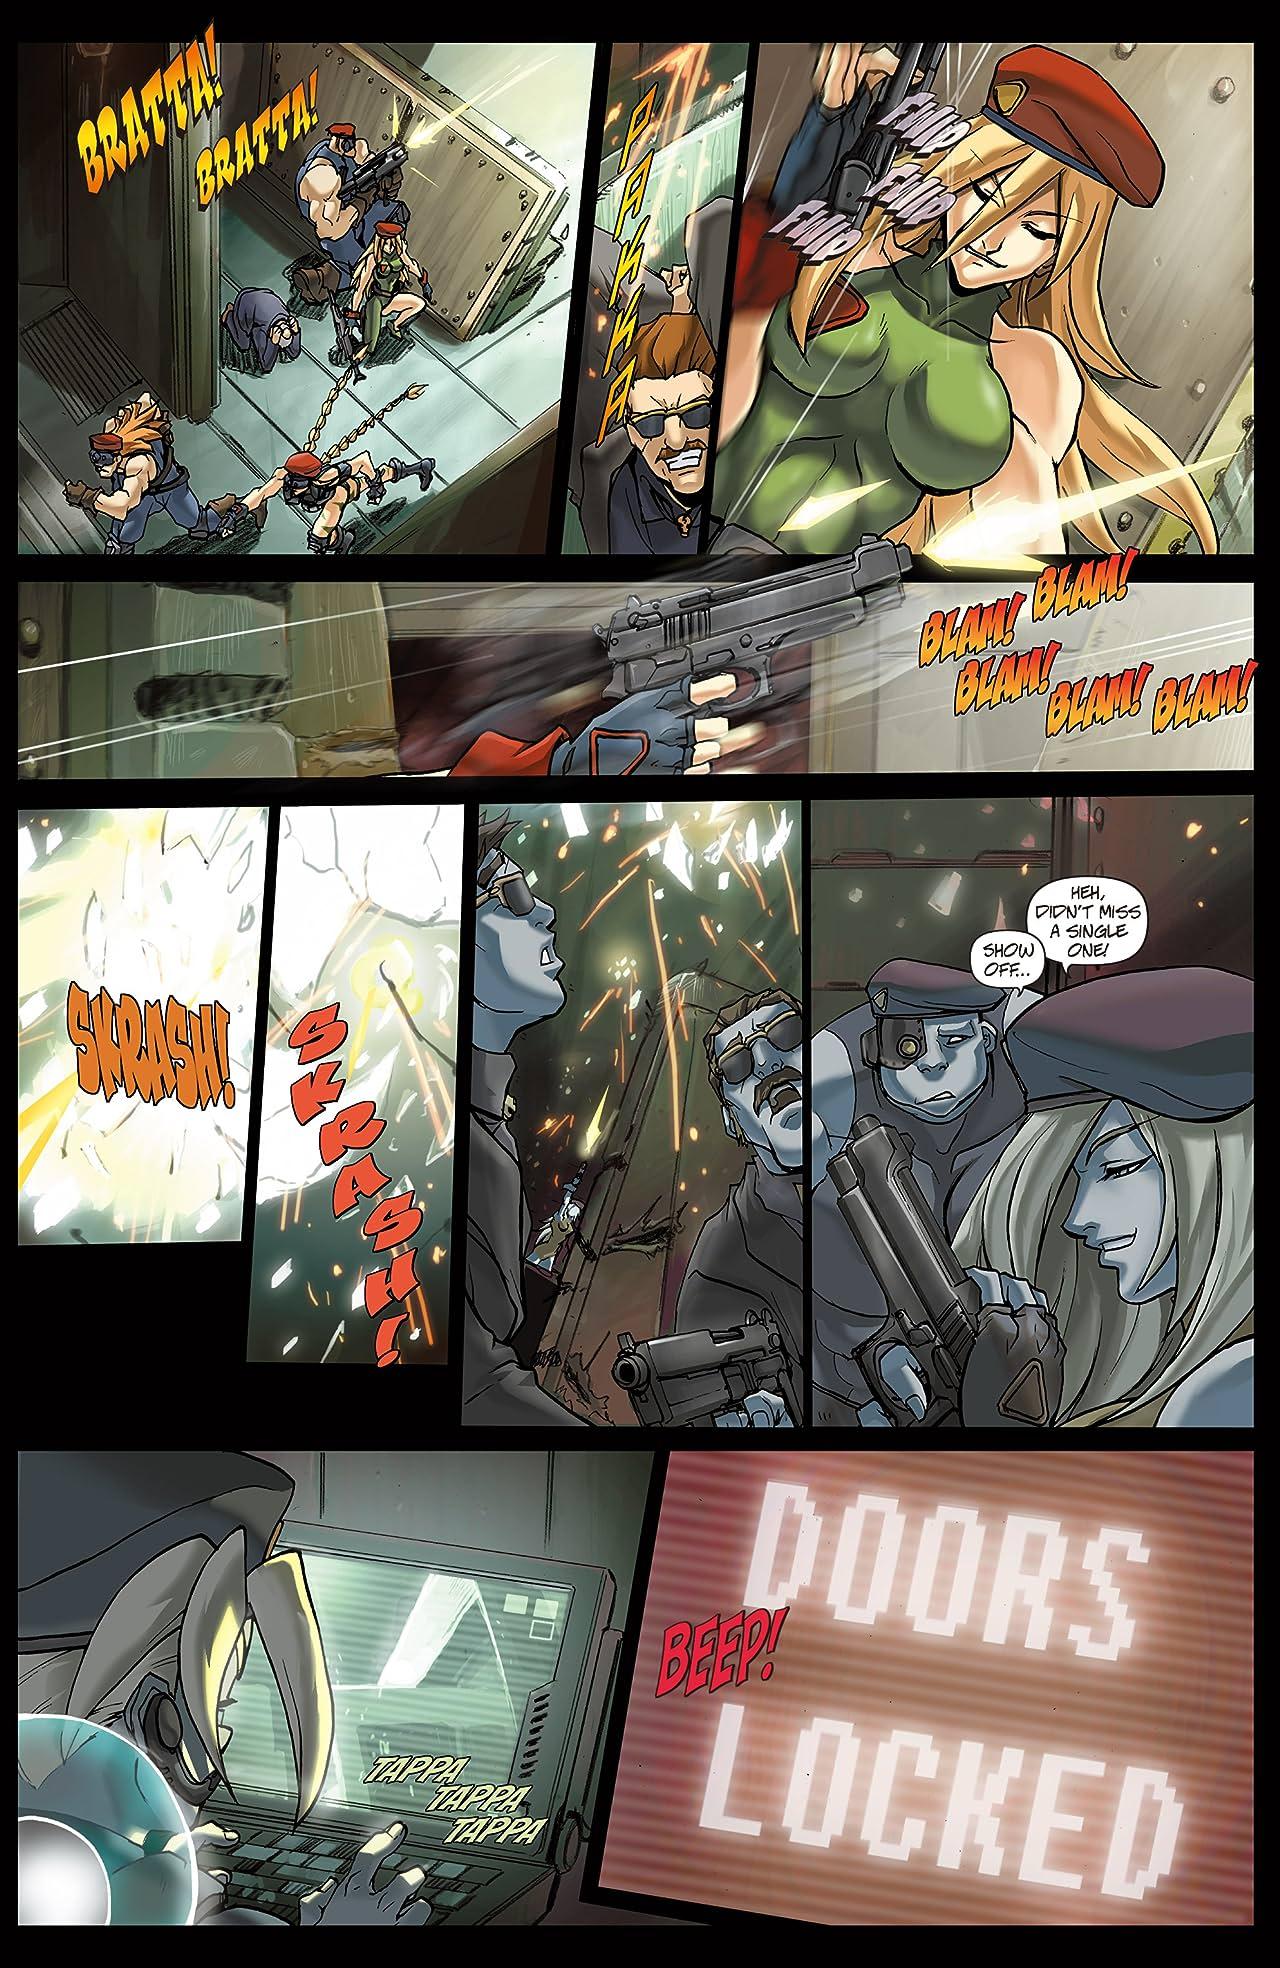 Street Fighter #7